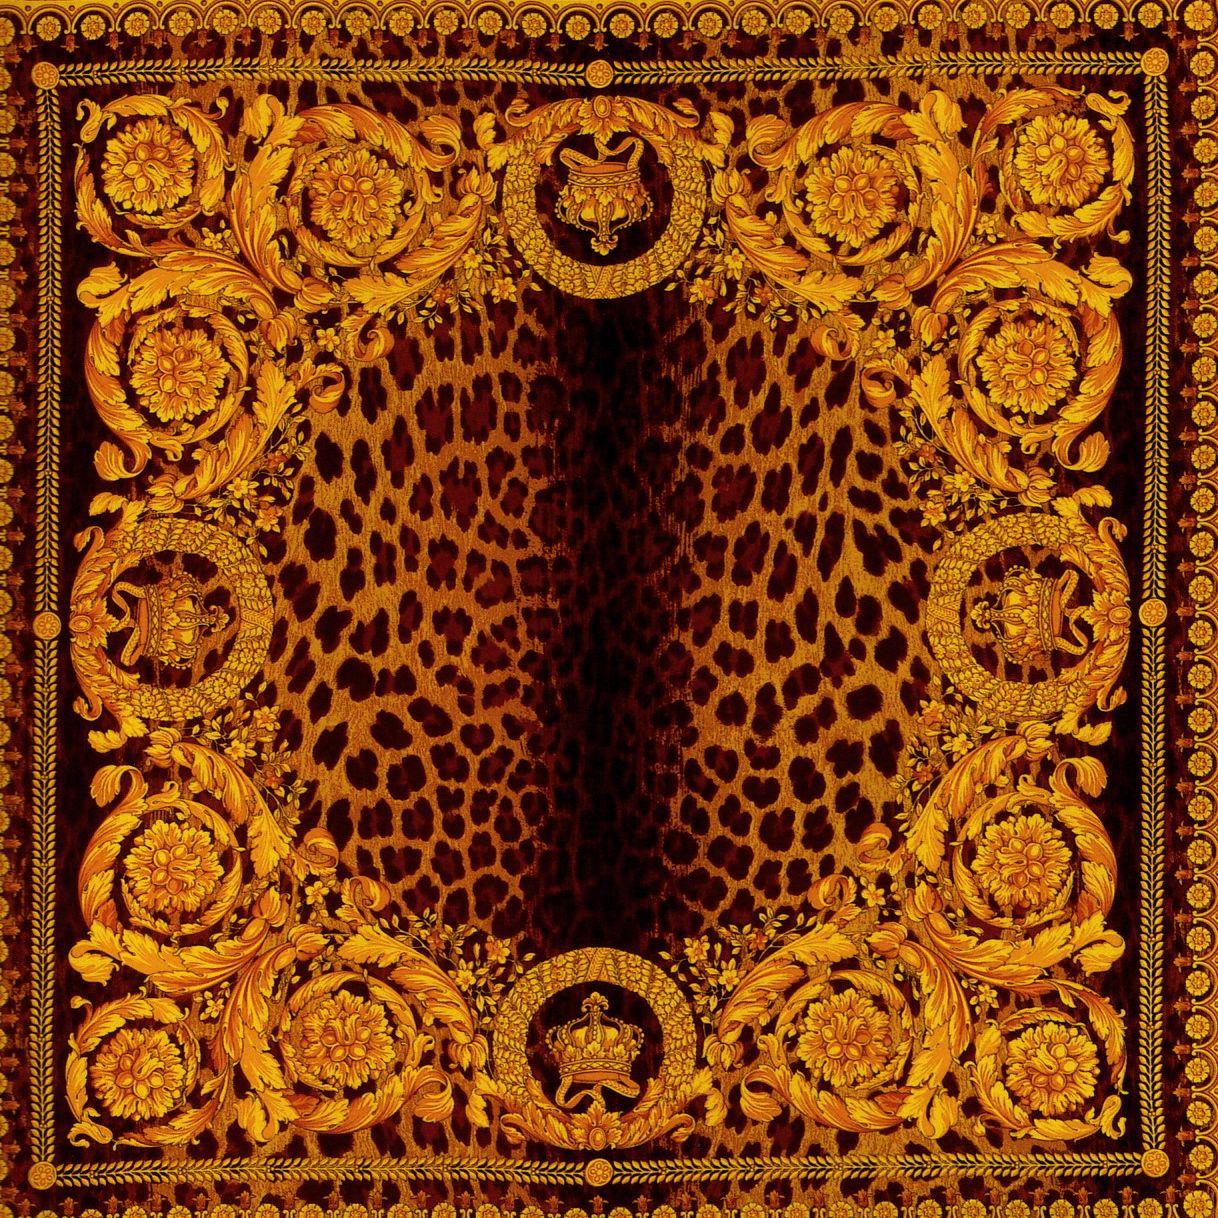 versace pattern wallpaper - photo #41